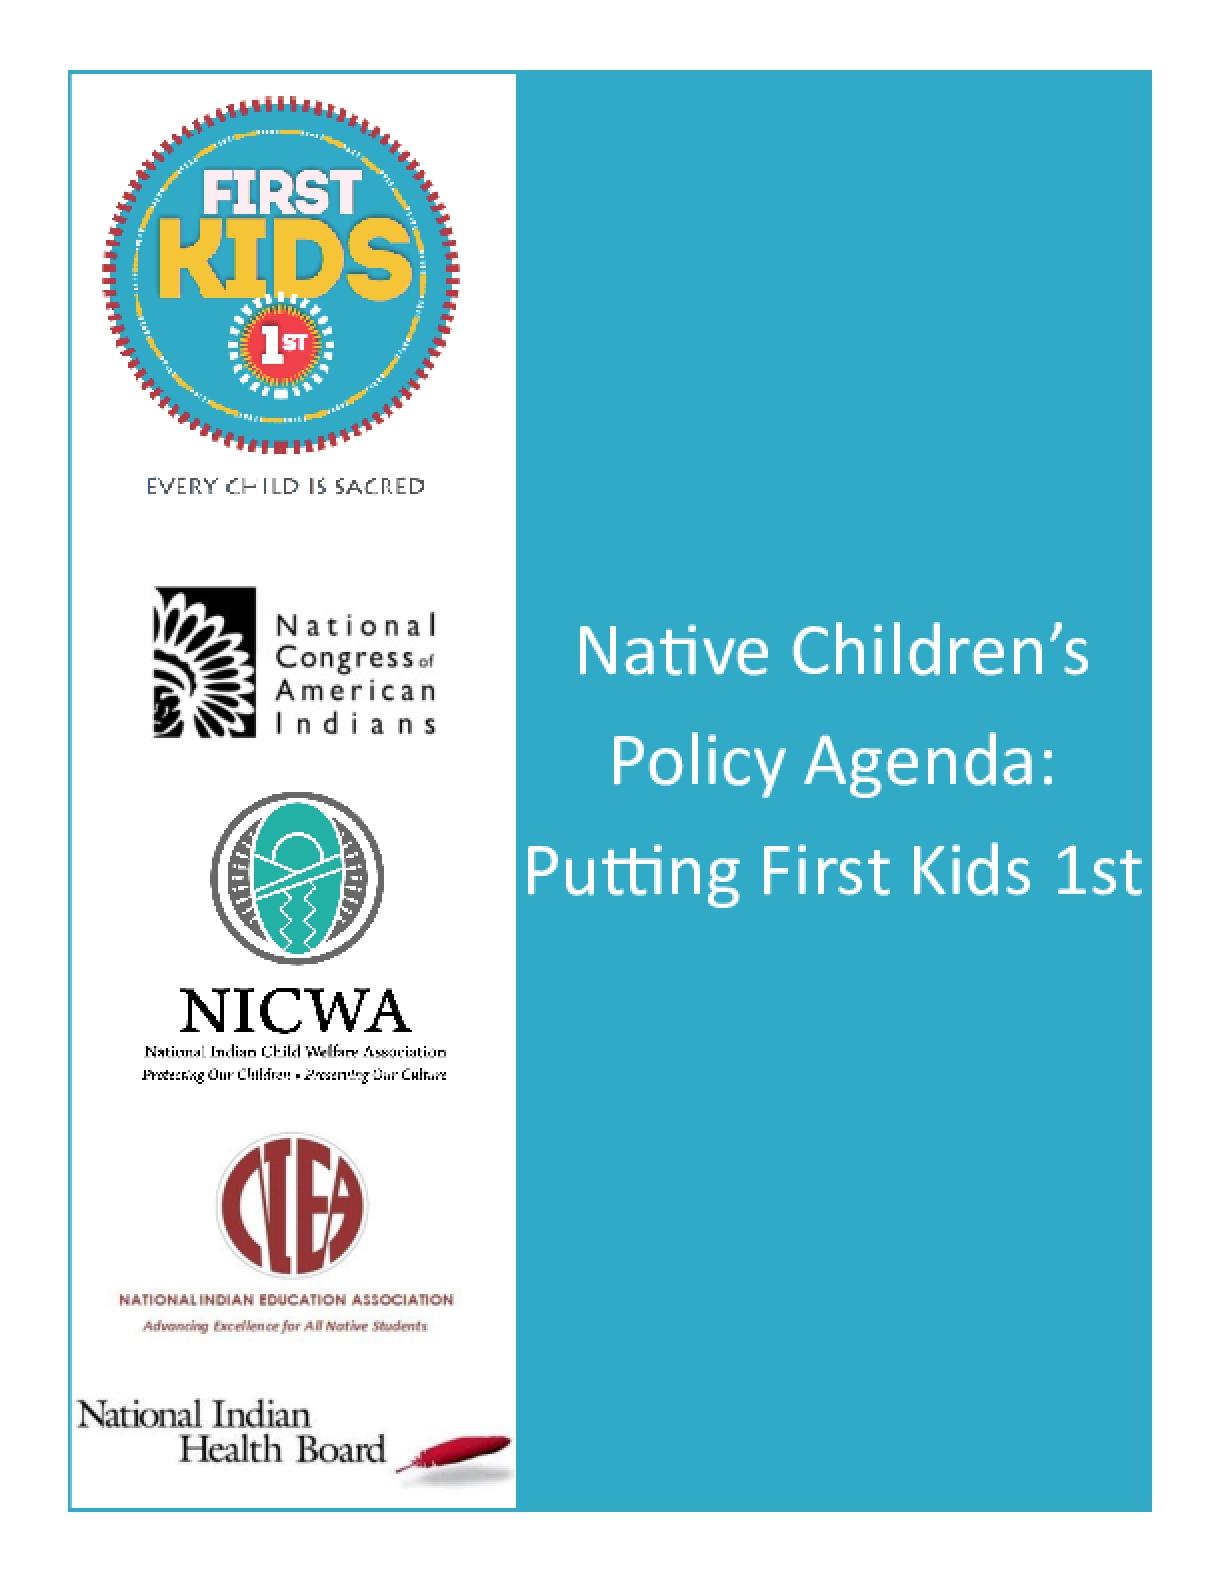 Native Children's Policy Agenda: Putting First Kids 1st